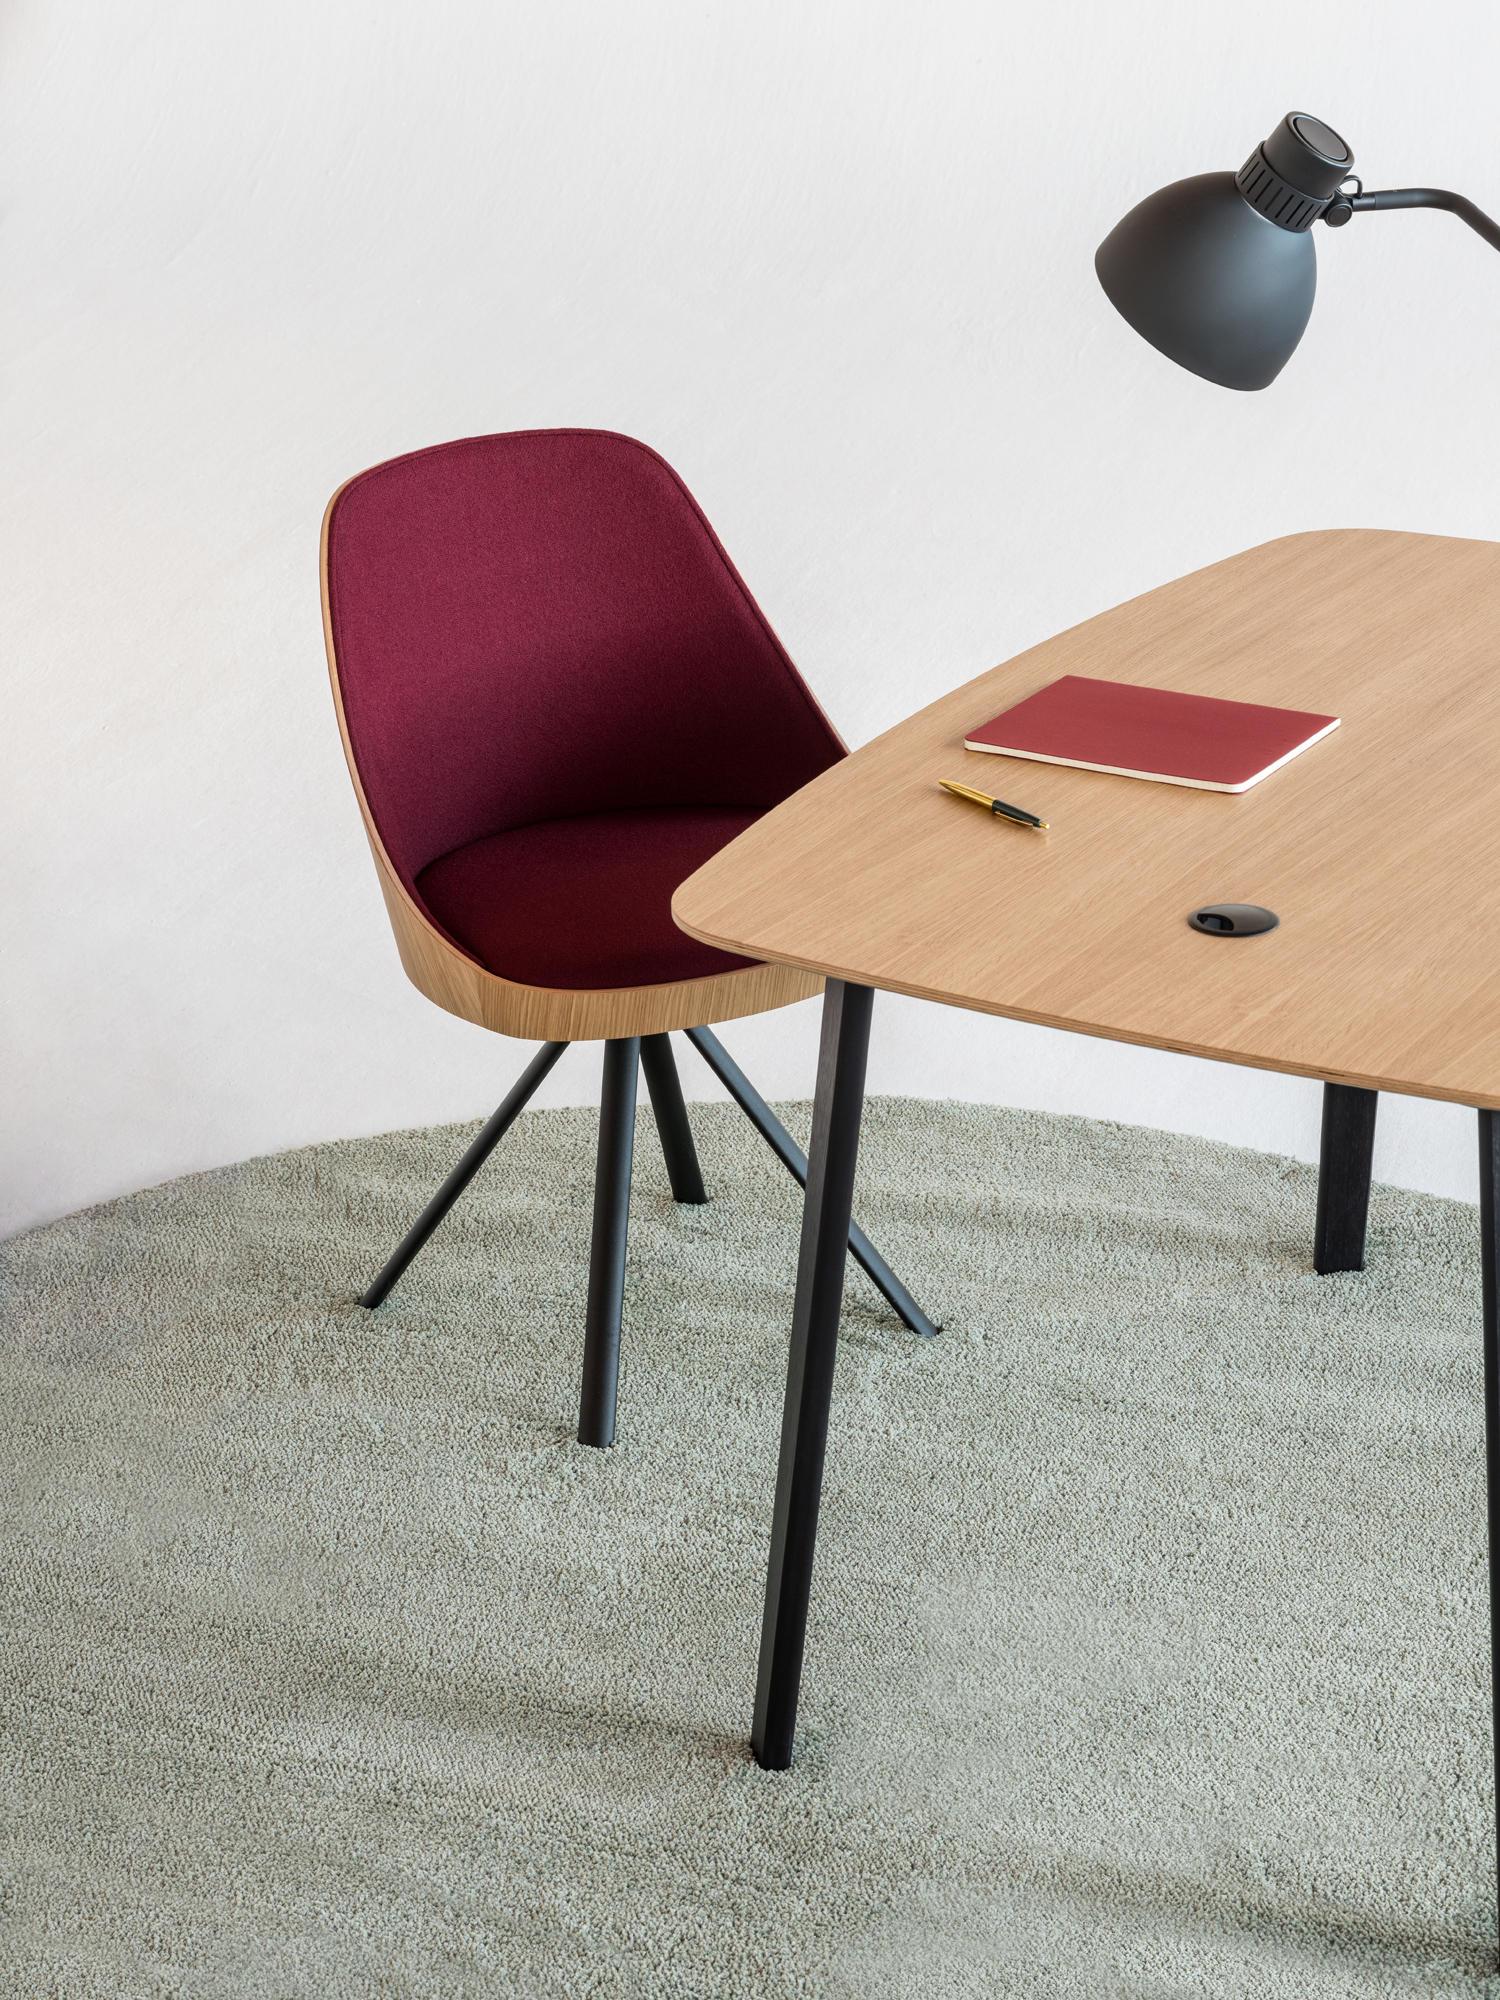 Kaiak Lounge by Estudi Manel Molina for ENEA